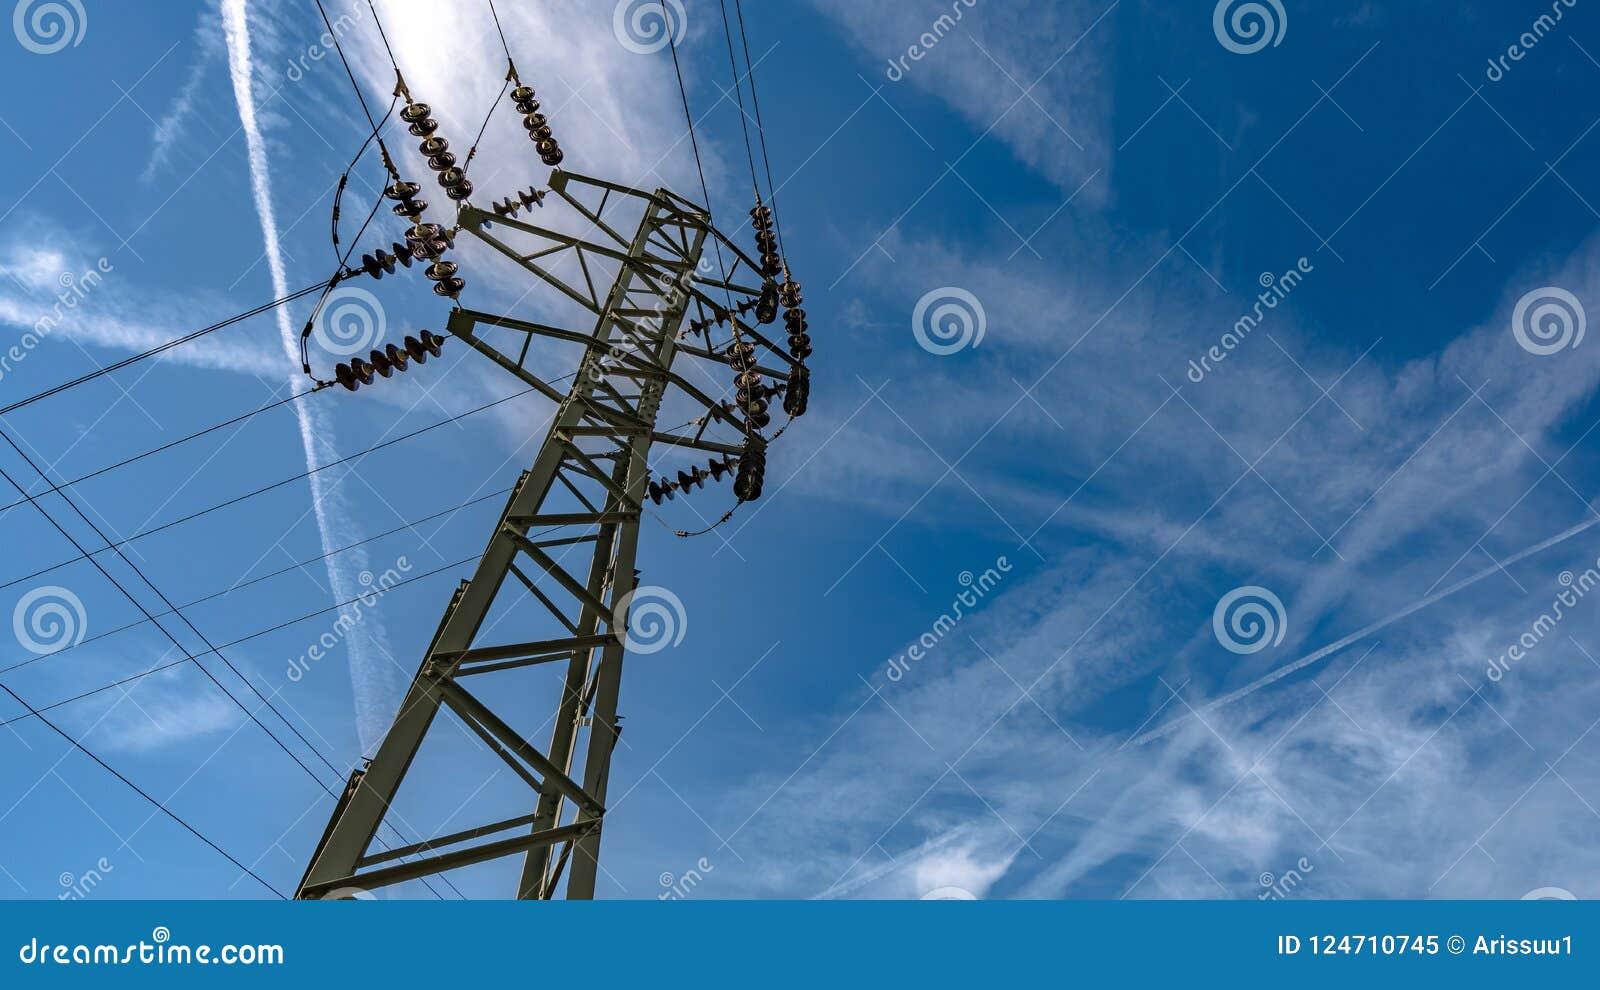 High Voltage Electricity Distribution Line